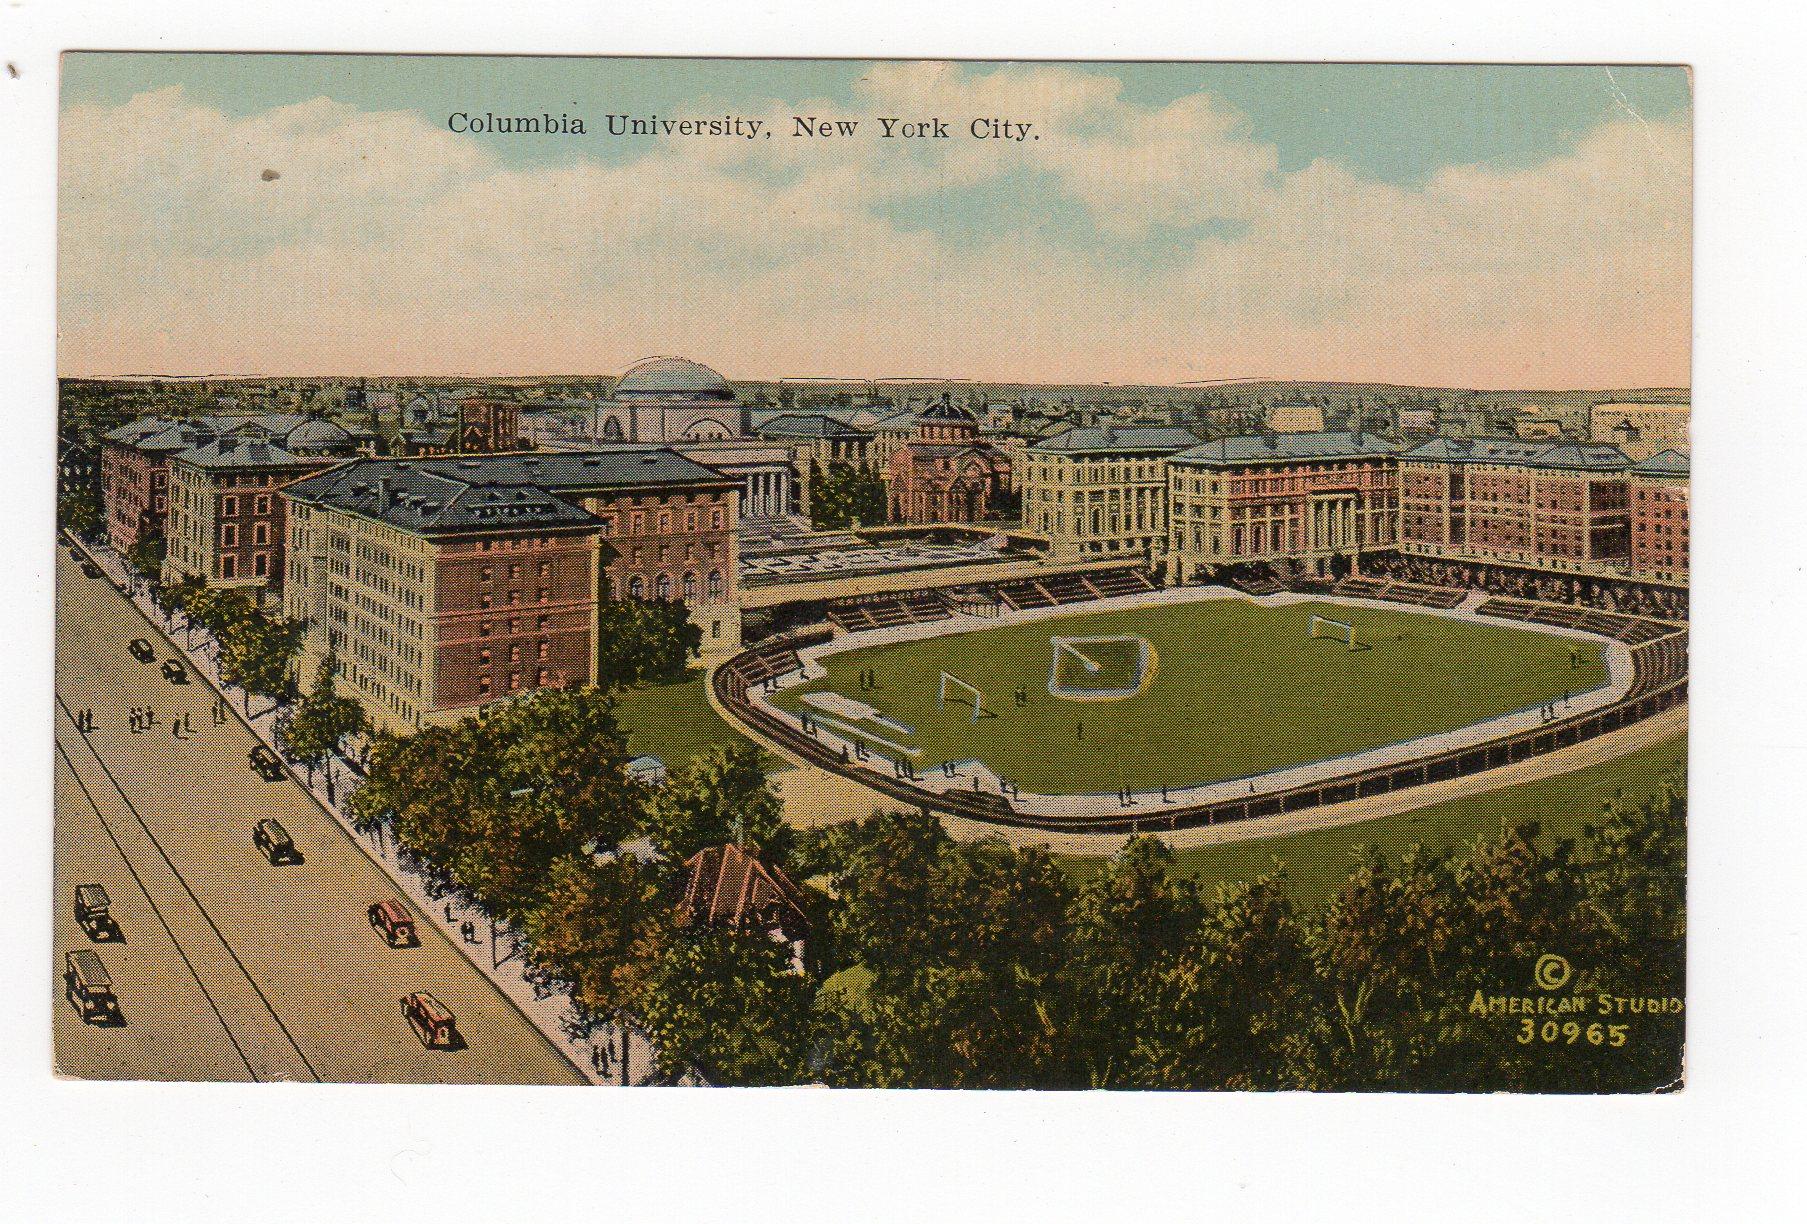 Madison Square Garden: Old Postcard. Columbia University, New York City. Stadium